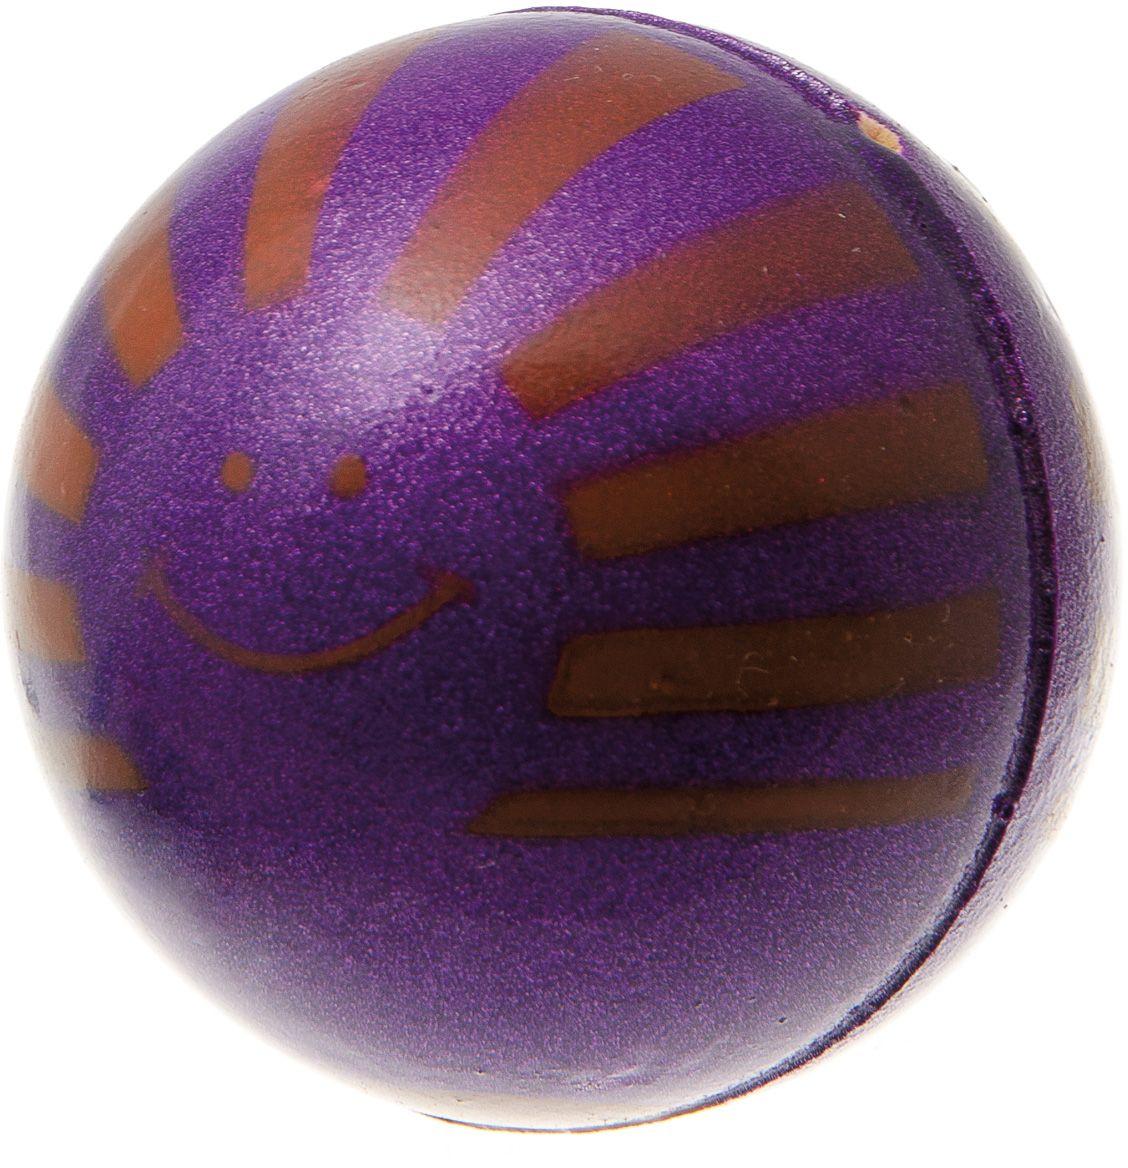 Мяч V.I.Pet Солнце, цвет: фиолетовый, 63 мм. 20-111820-1118